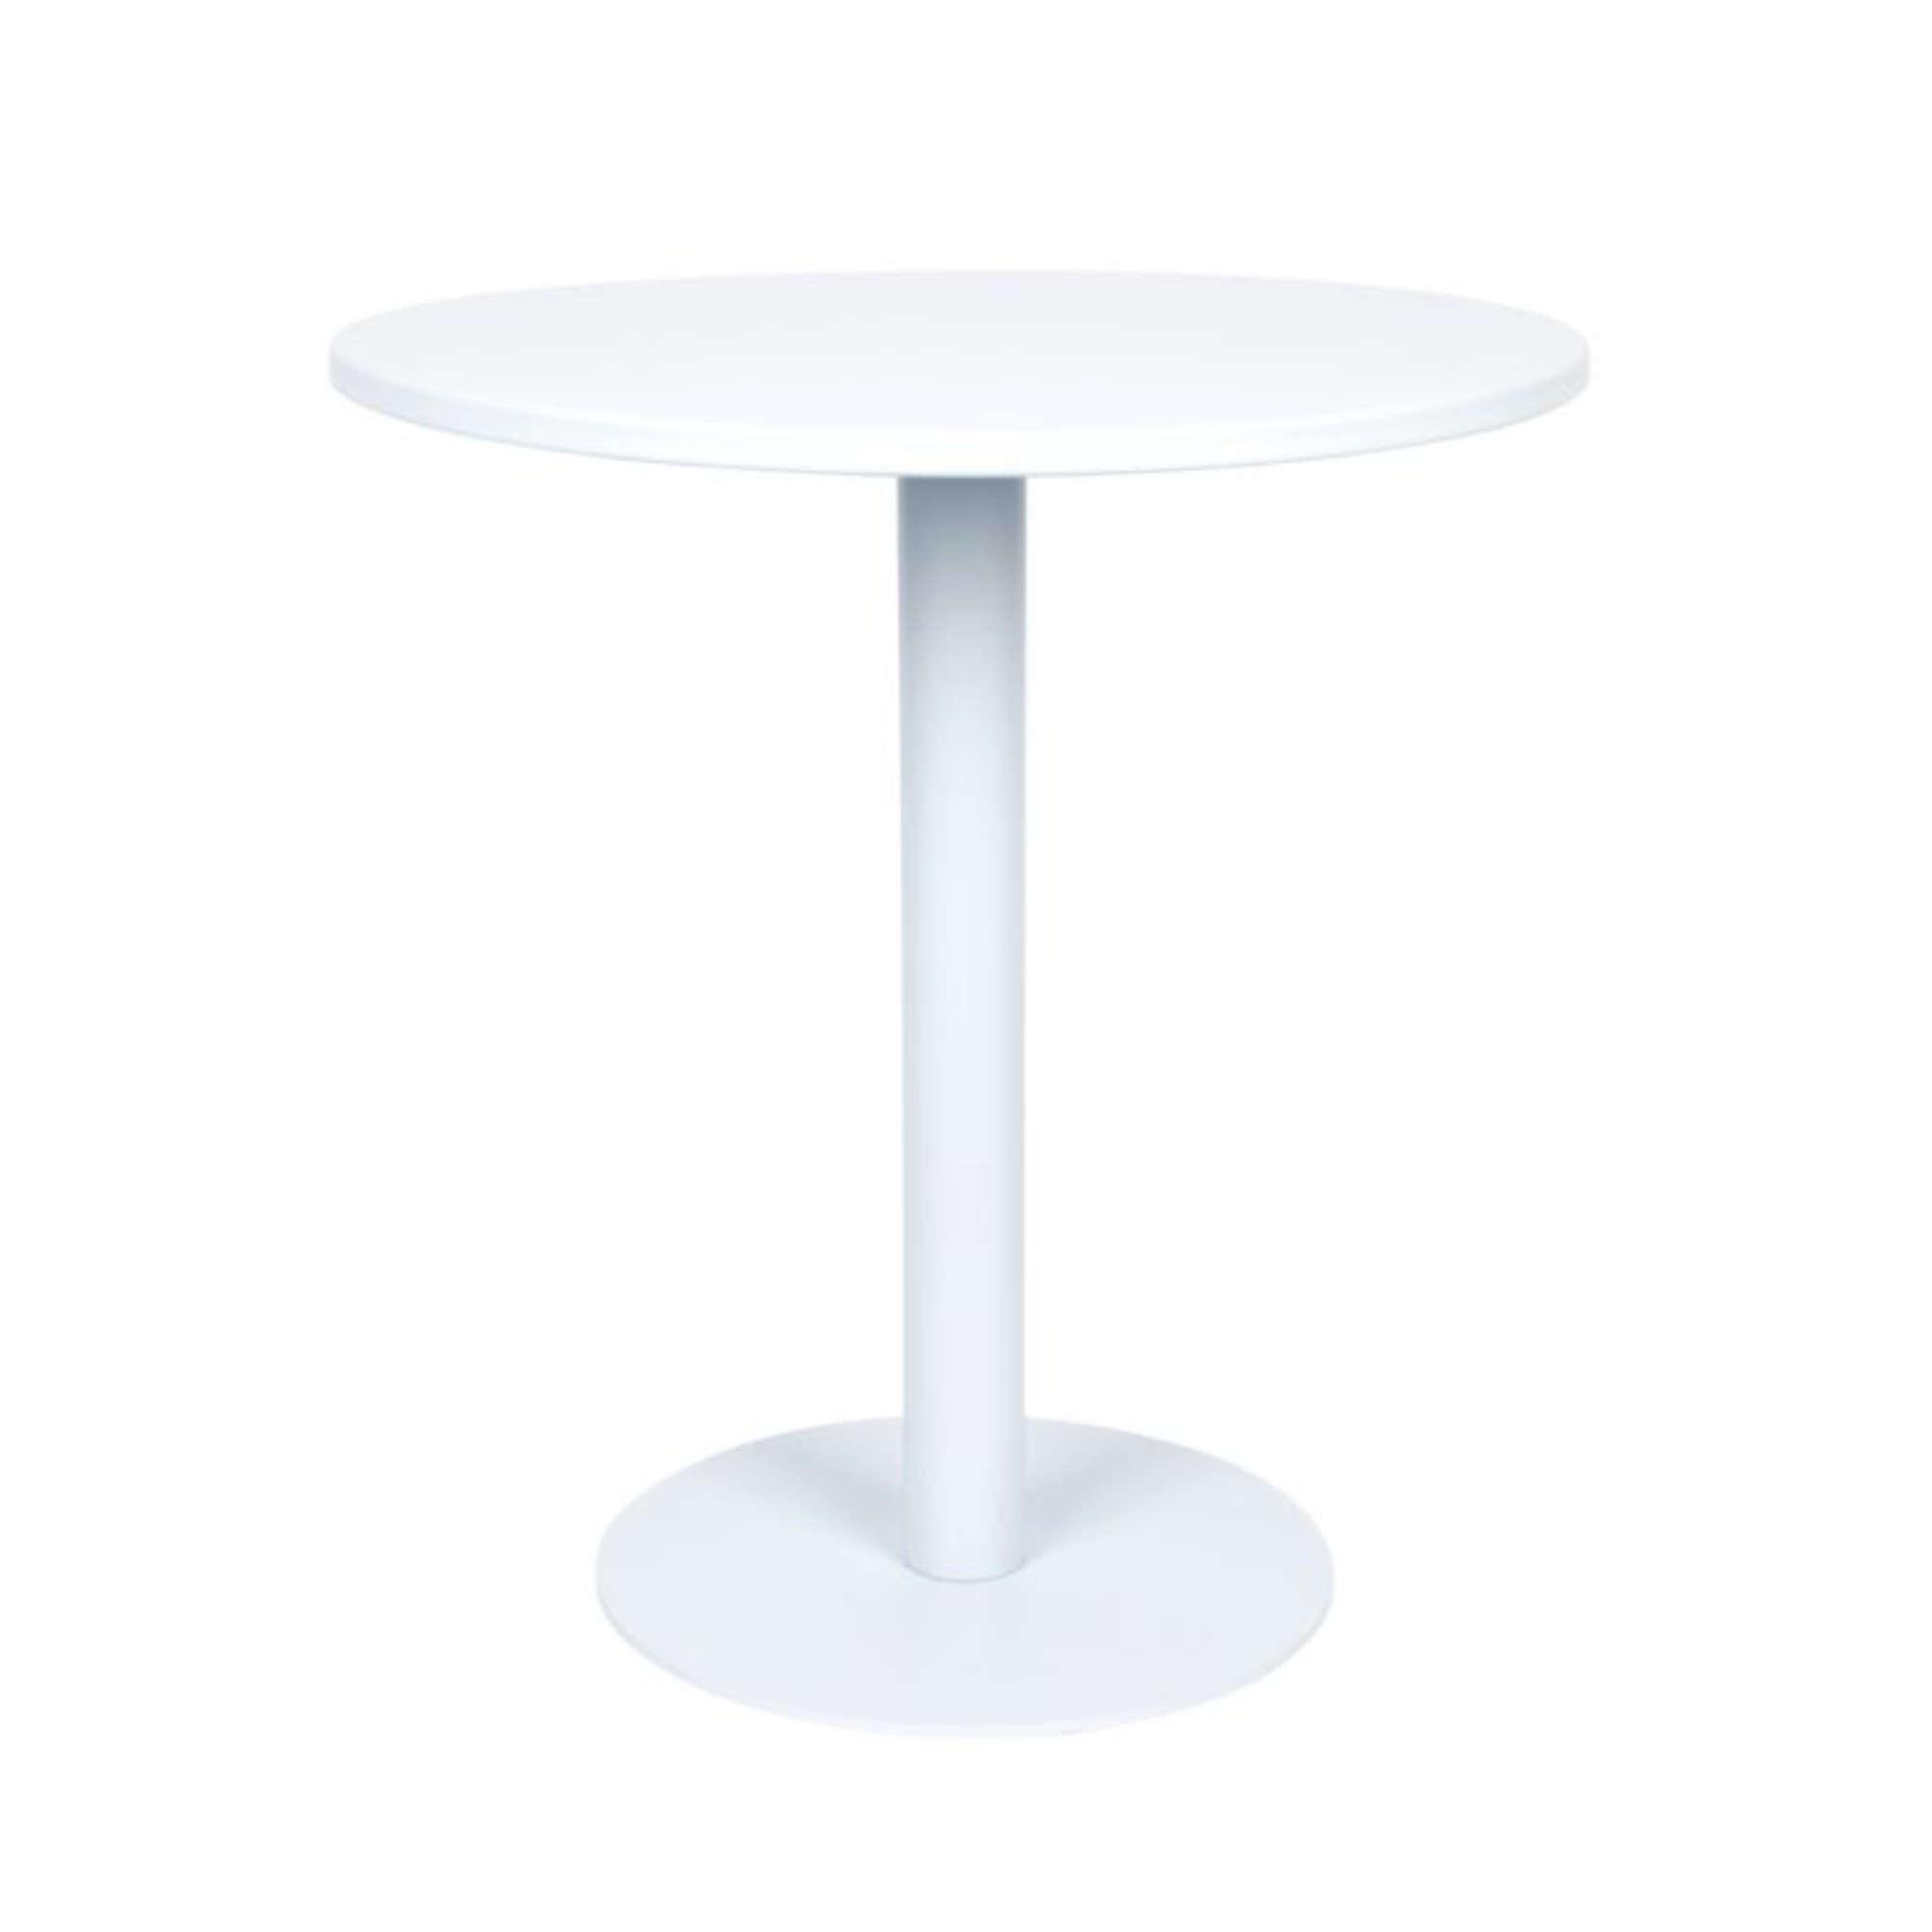 Zuiver Bistrotisch Metsu Weiss 70 Cm Rund Outdoor Esszimmertische Tische Gabler24 Com Mobel Online Bestellen